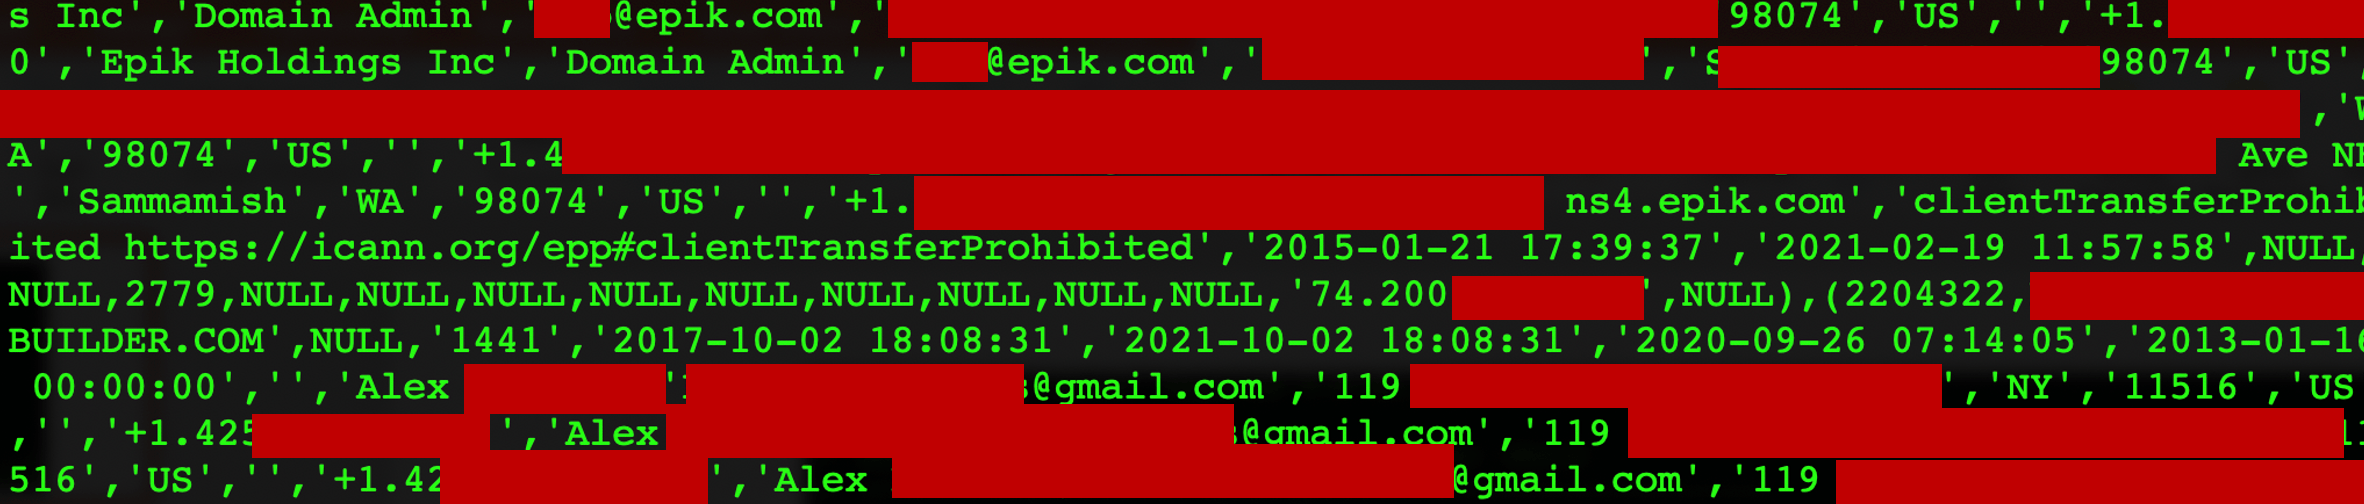 Epik's WHOIS database, part of the 180 GB leak.